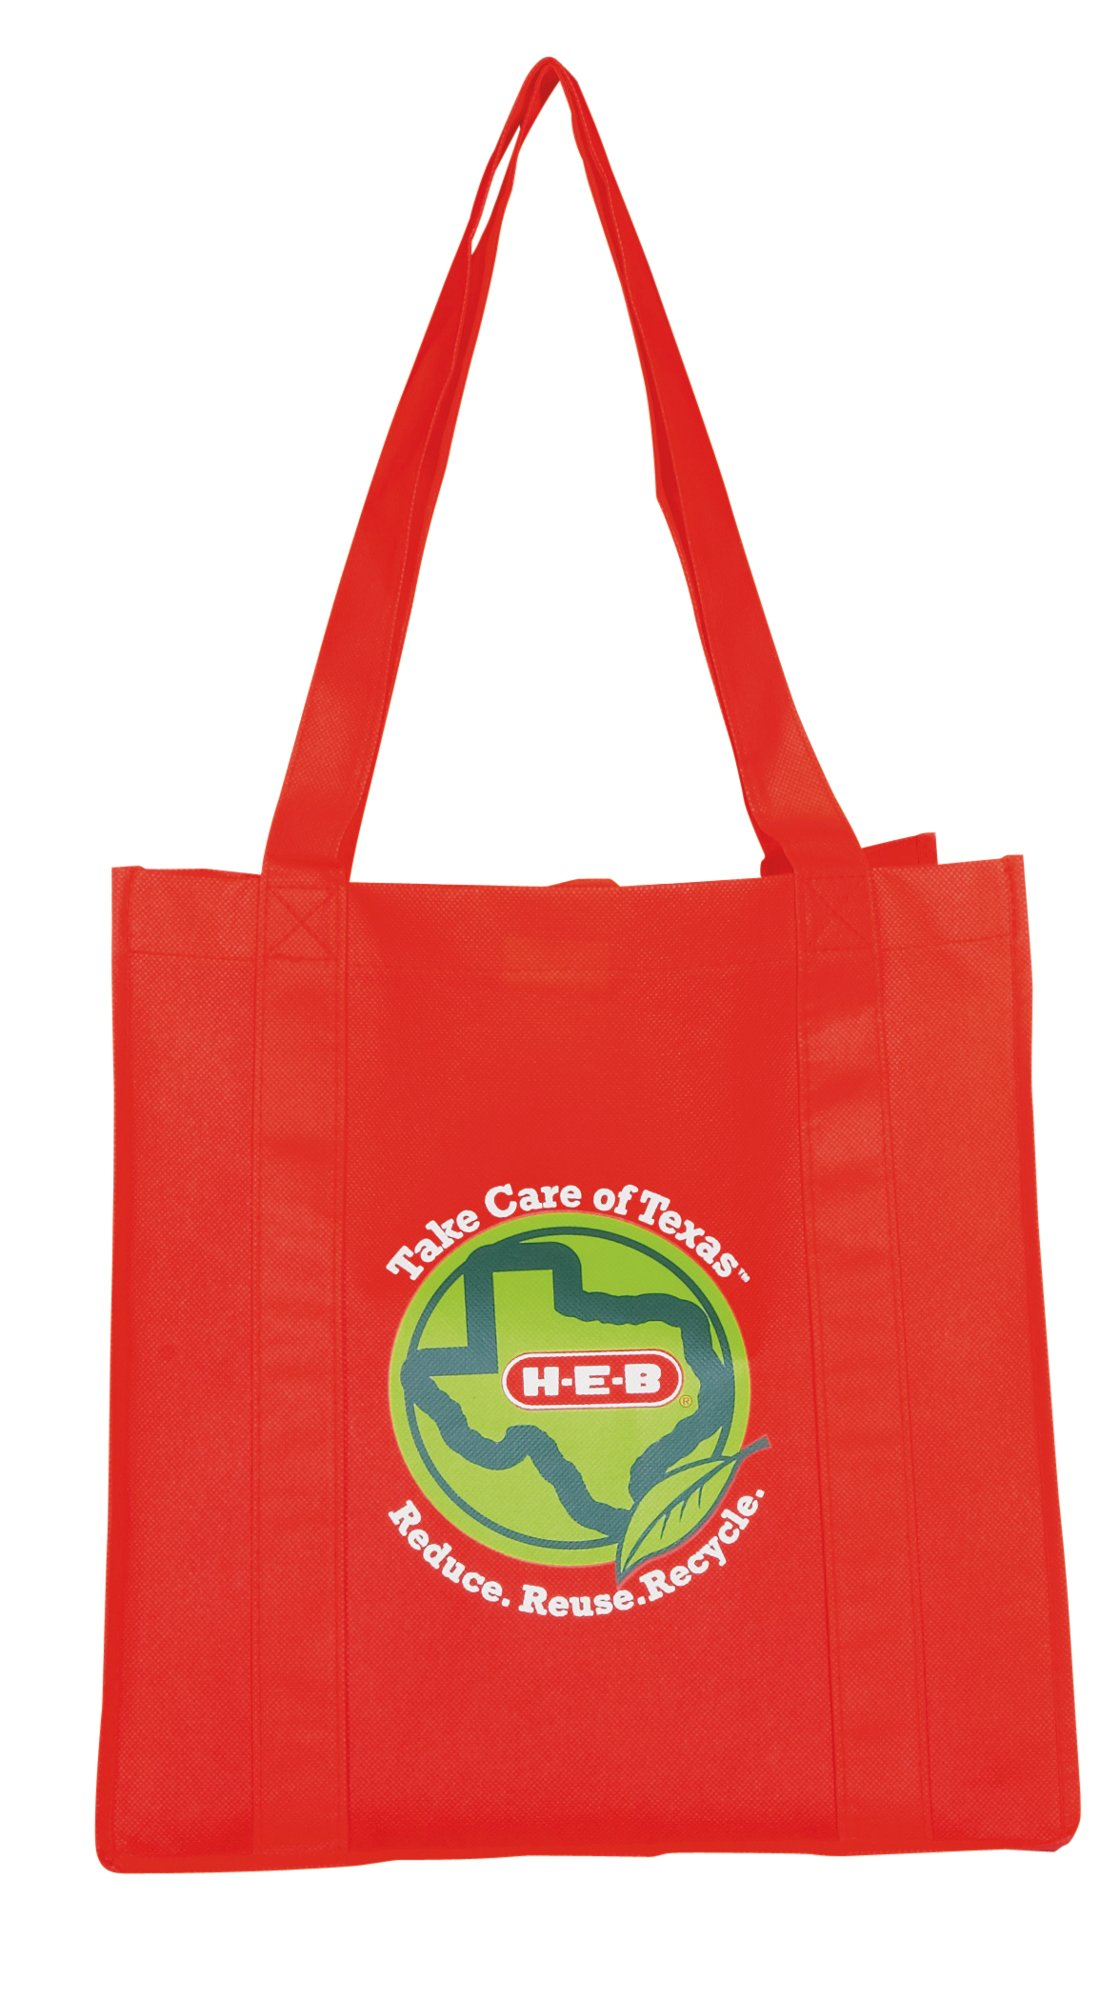 H‑E‑B Reusable Shopping Bag, Red ‑ Shop Kitchen at HEB